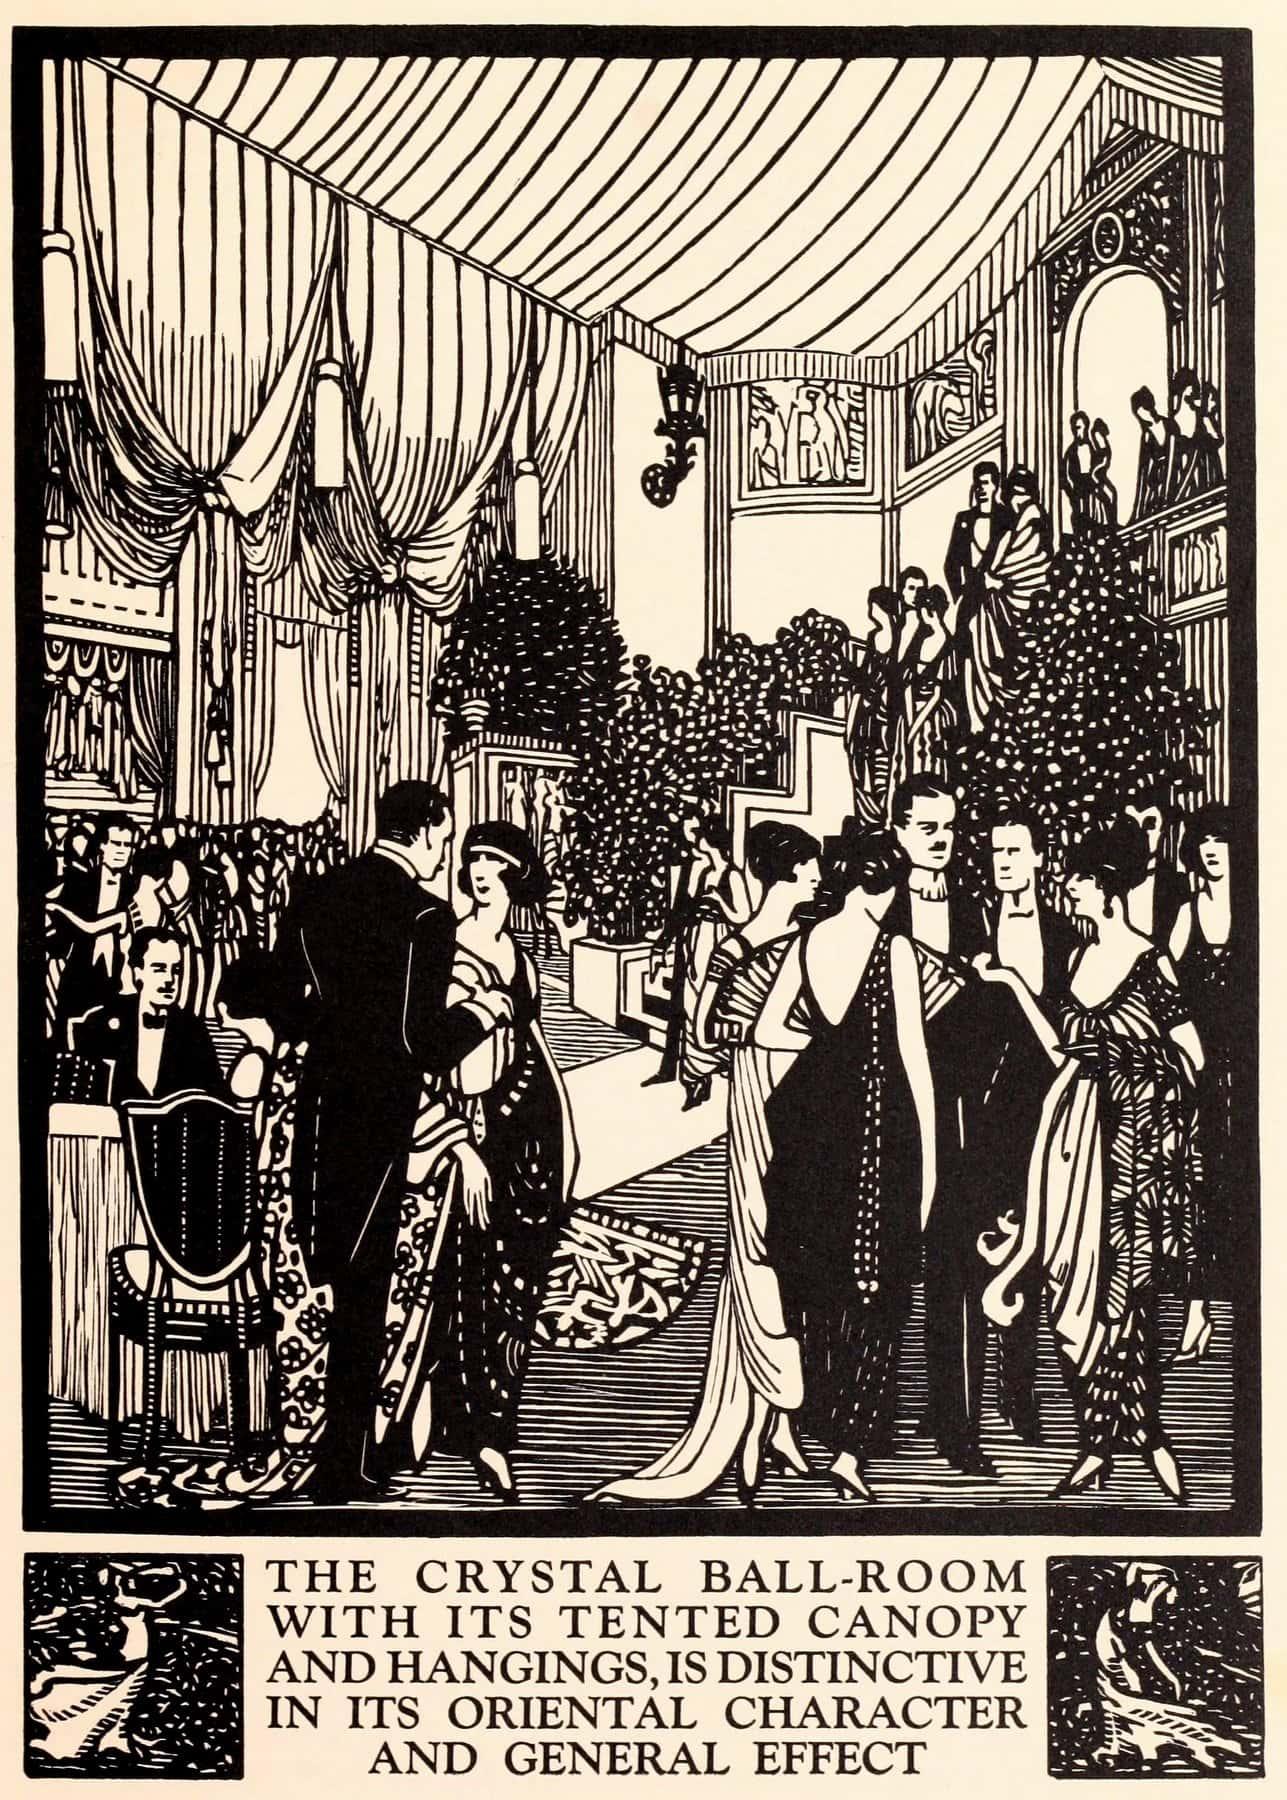 The Ritz-Carlton Hotel booklet from 1919 (6) - ClickAmericana com